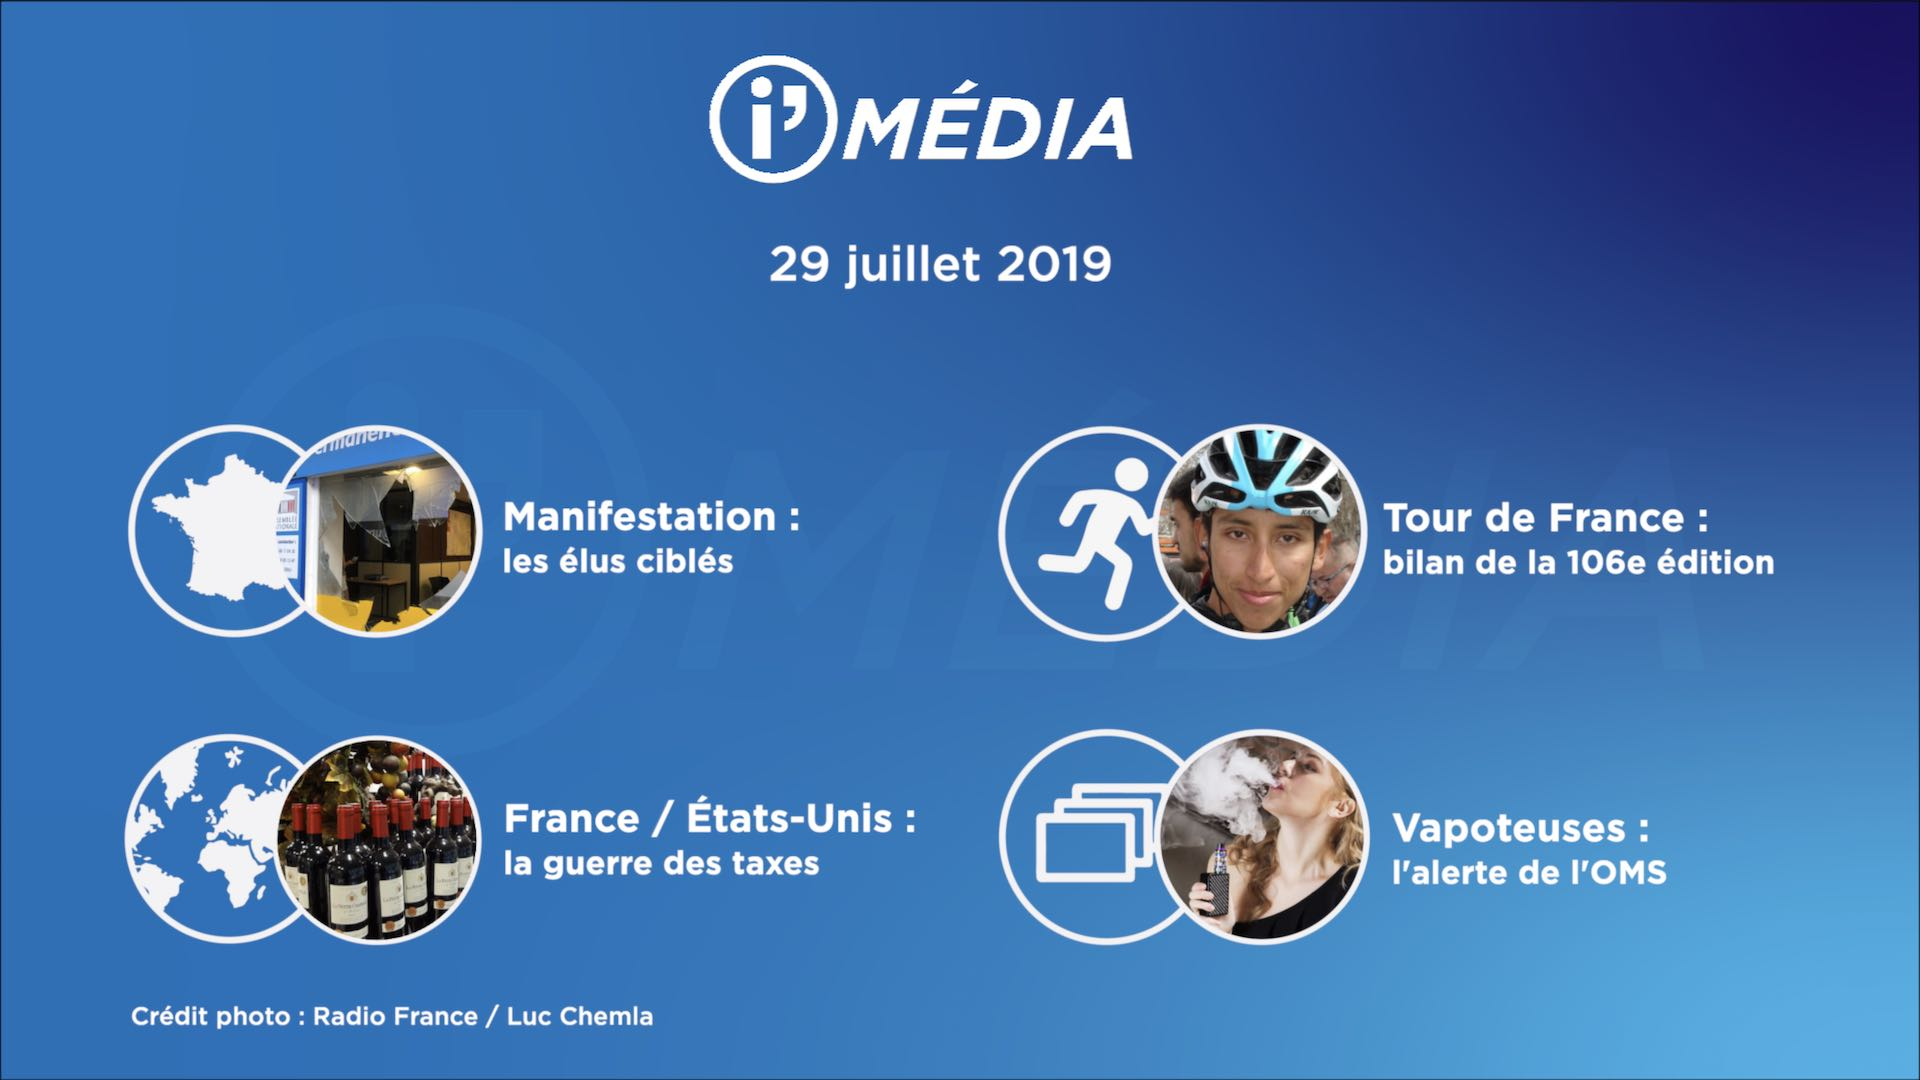 I'média 29 juillet 2019